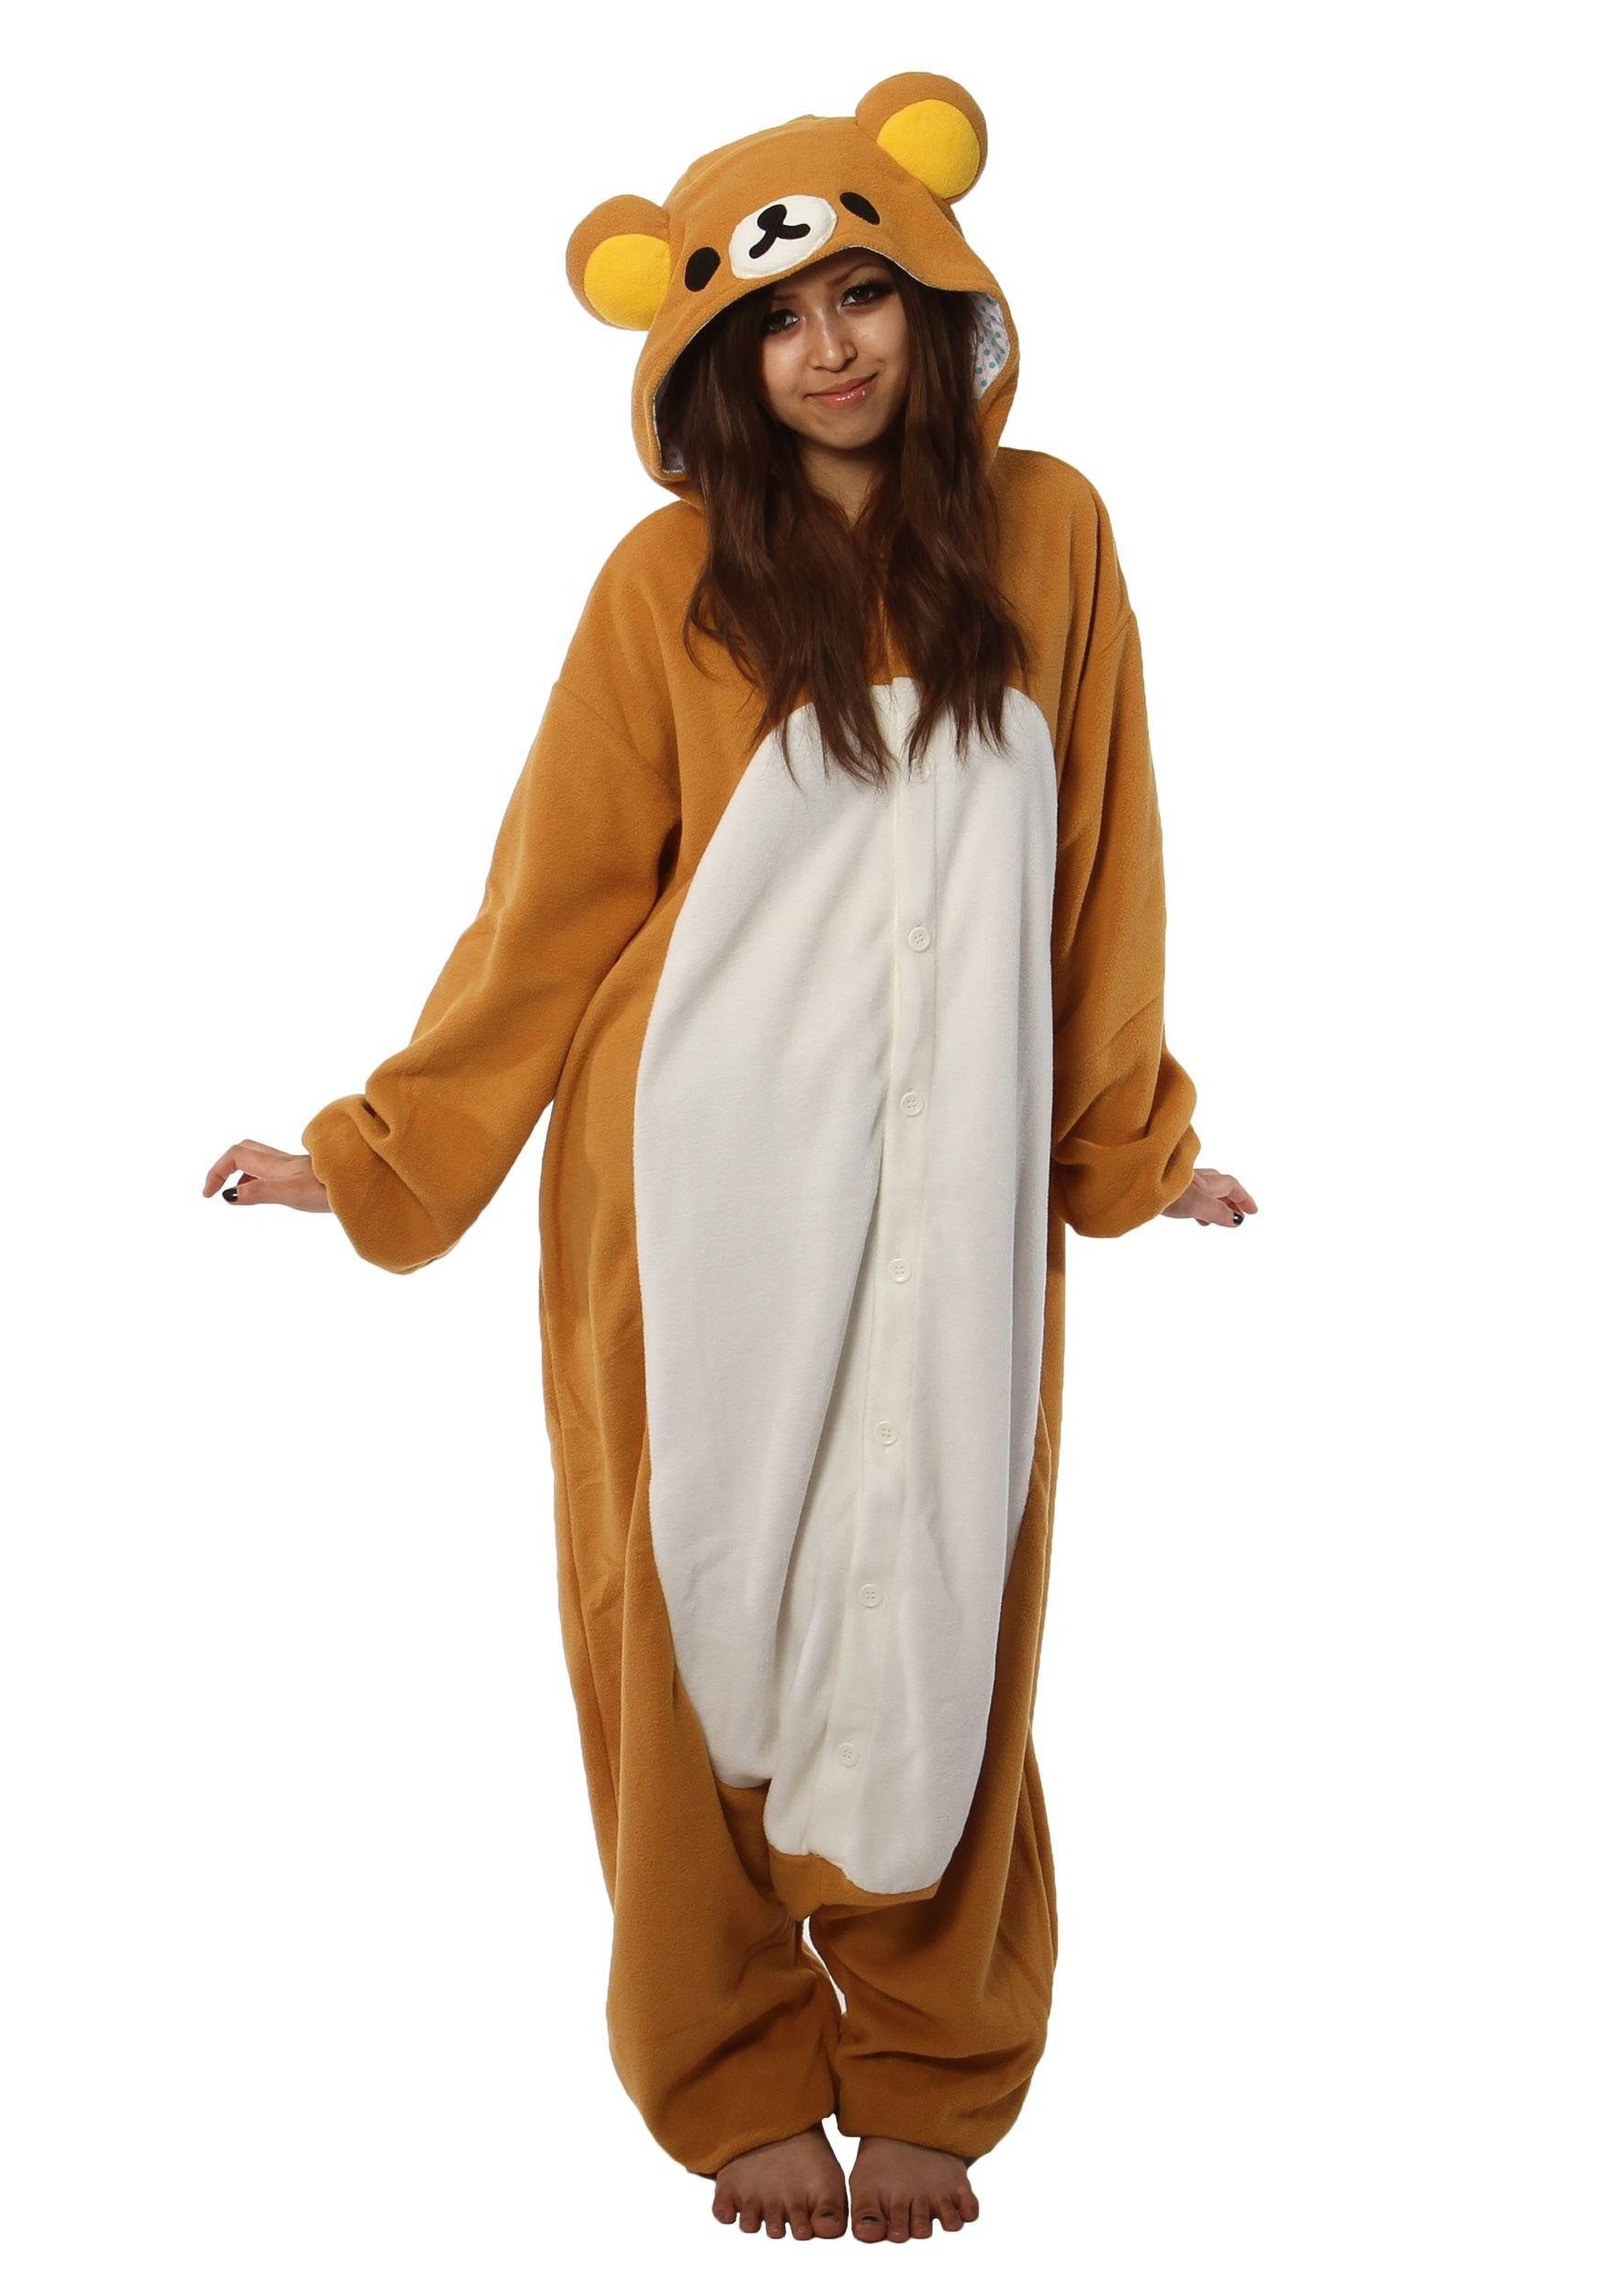 060e2402eb1 Adult Rilakkuma Kigurumi Pajama Costume